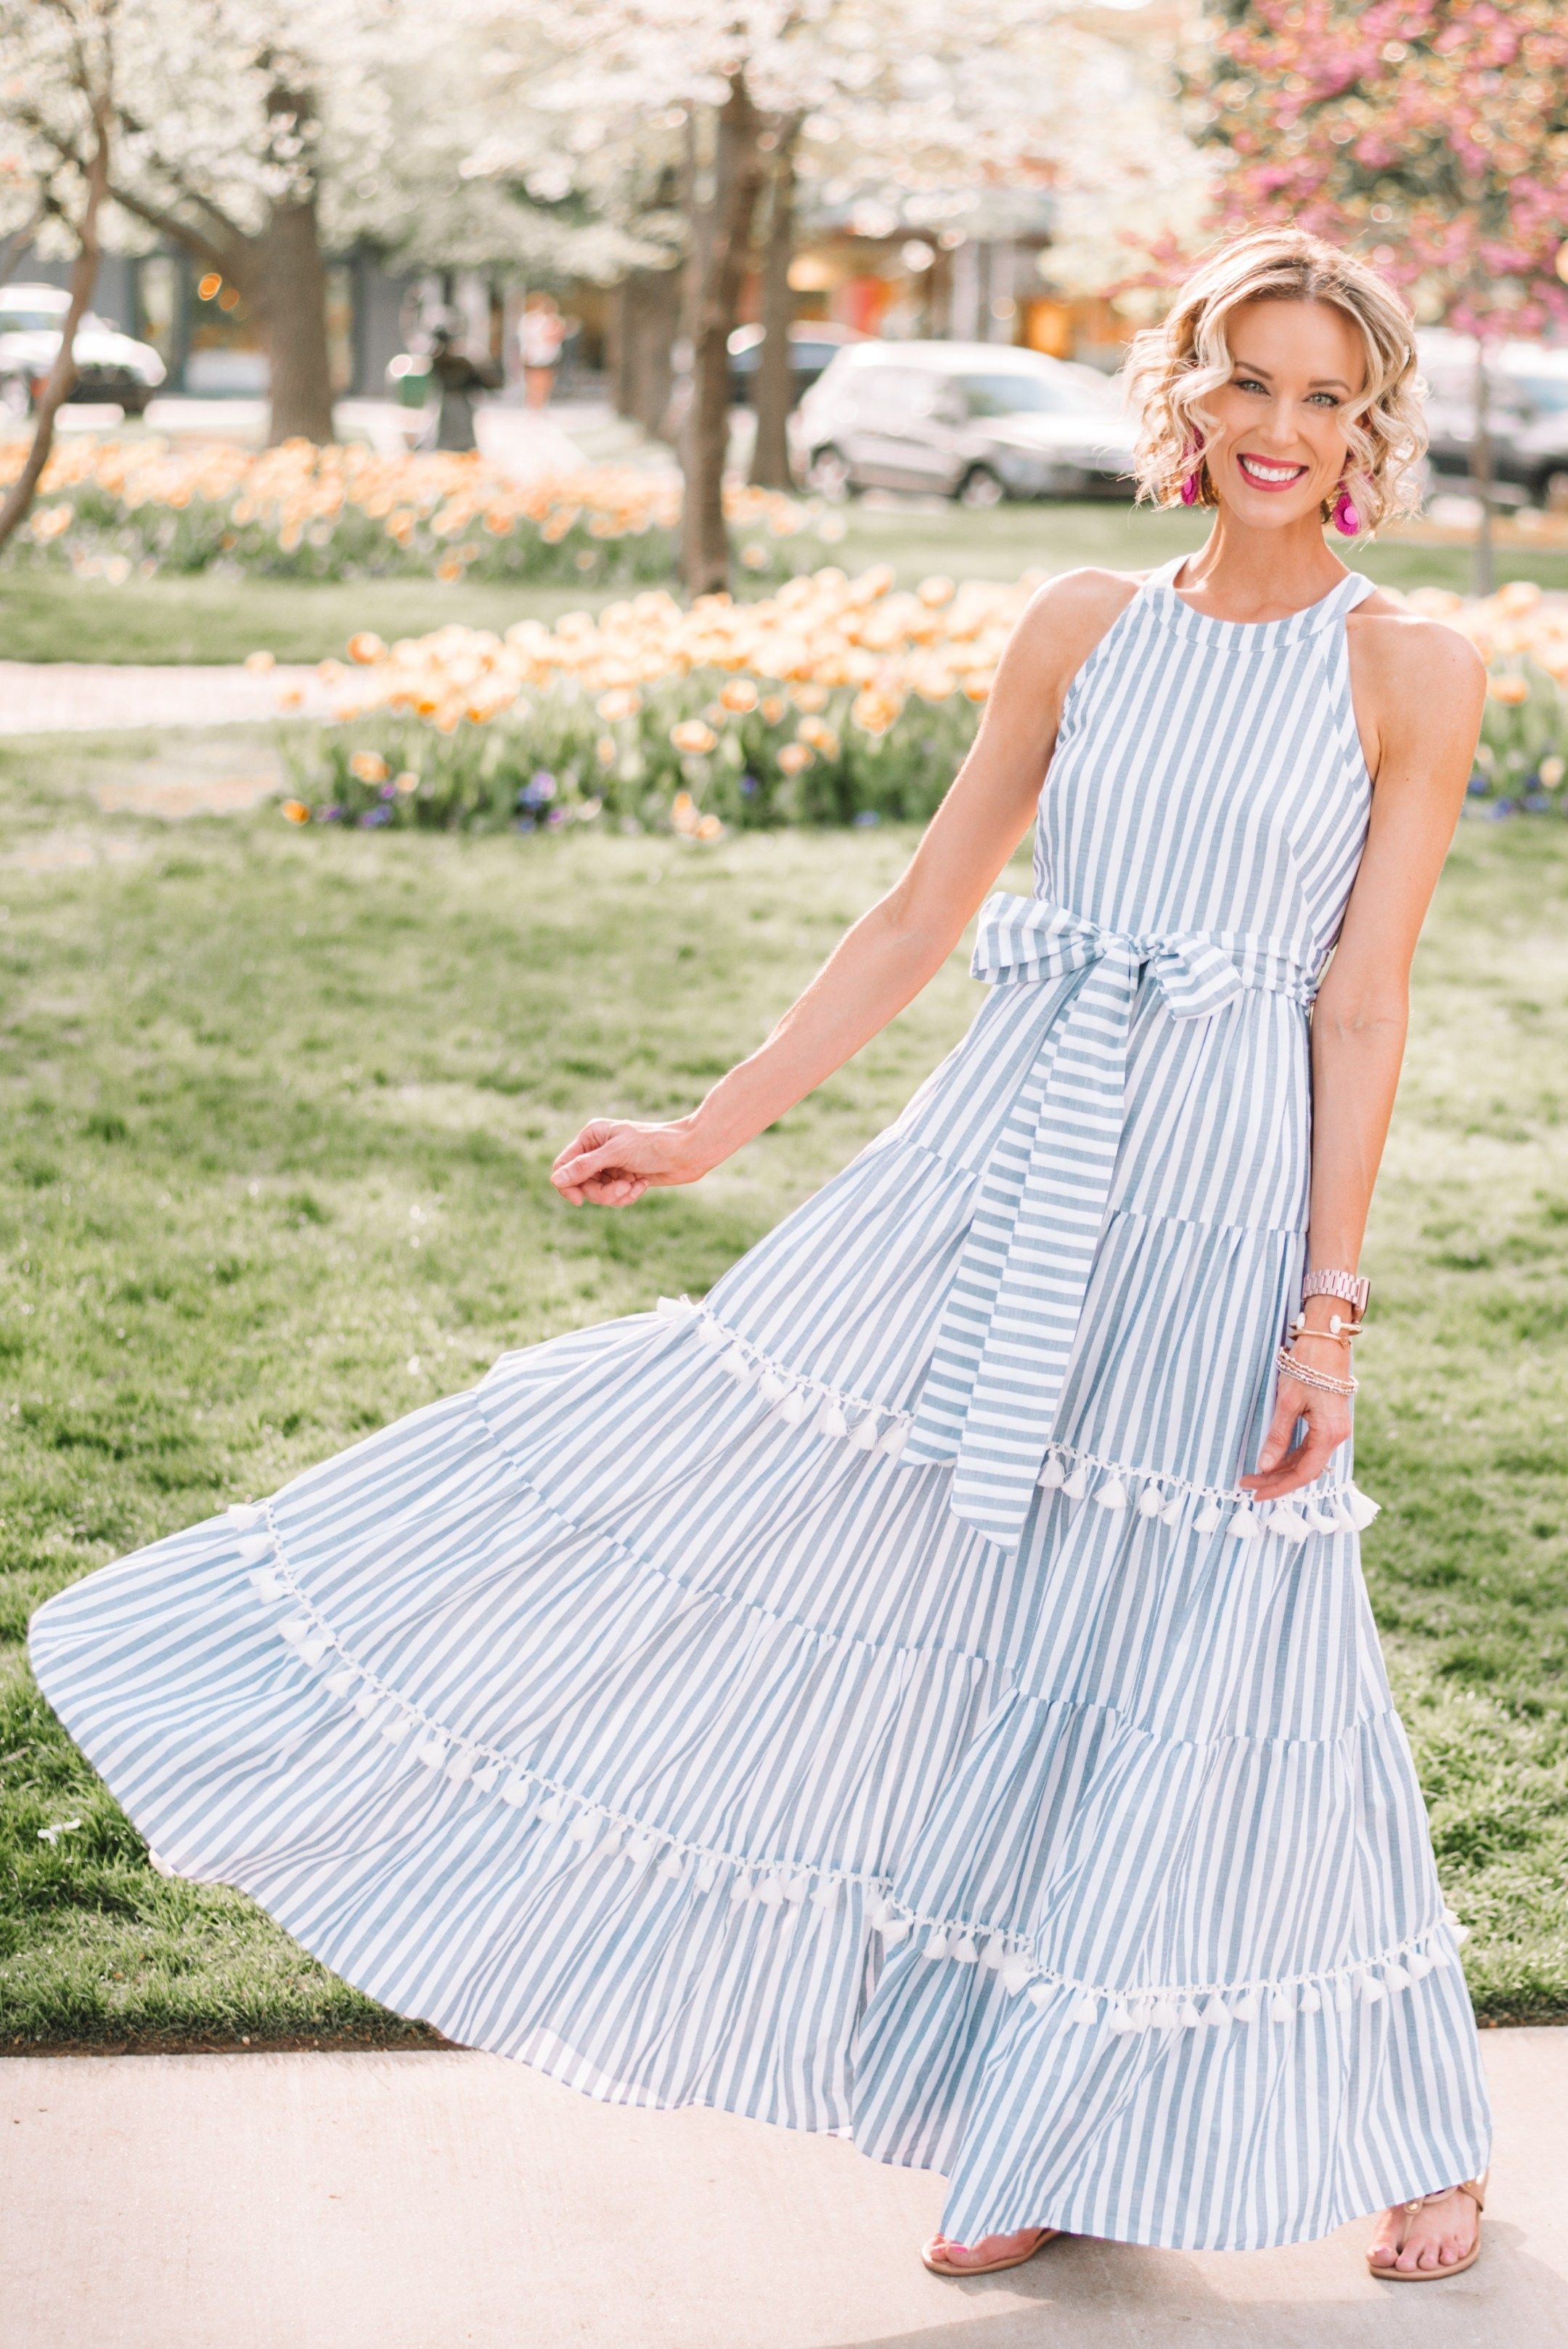 The Maxi Dress Of My Dreams Straight A Style Womens Fashion Spring Dresses Maxi Dress Fashion [ 3235 x 2160 Pixel ]